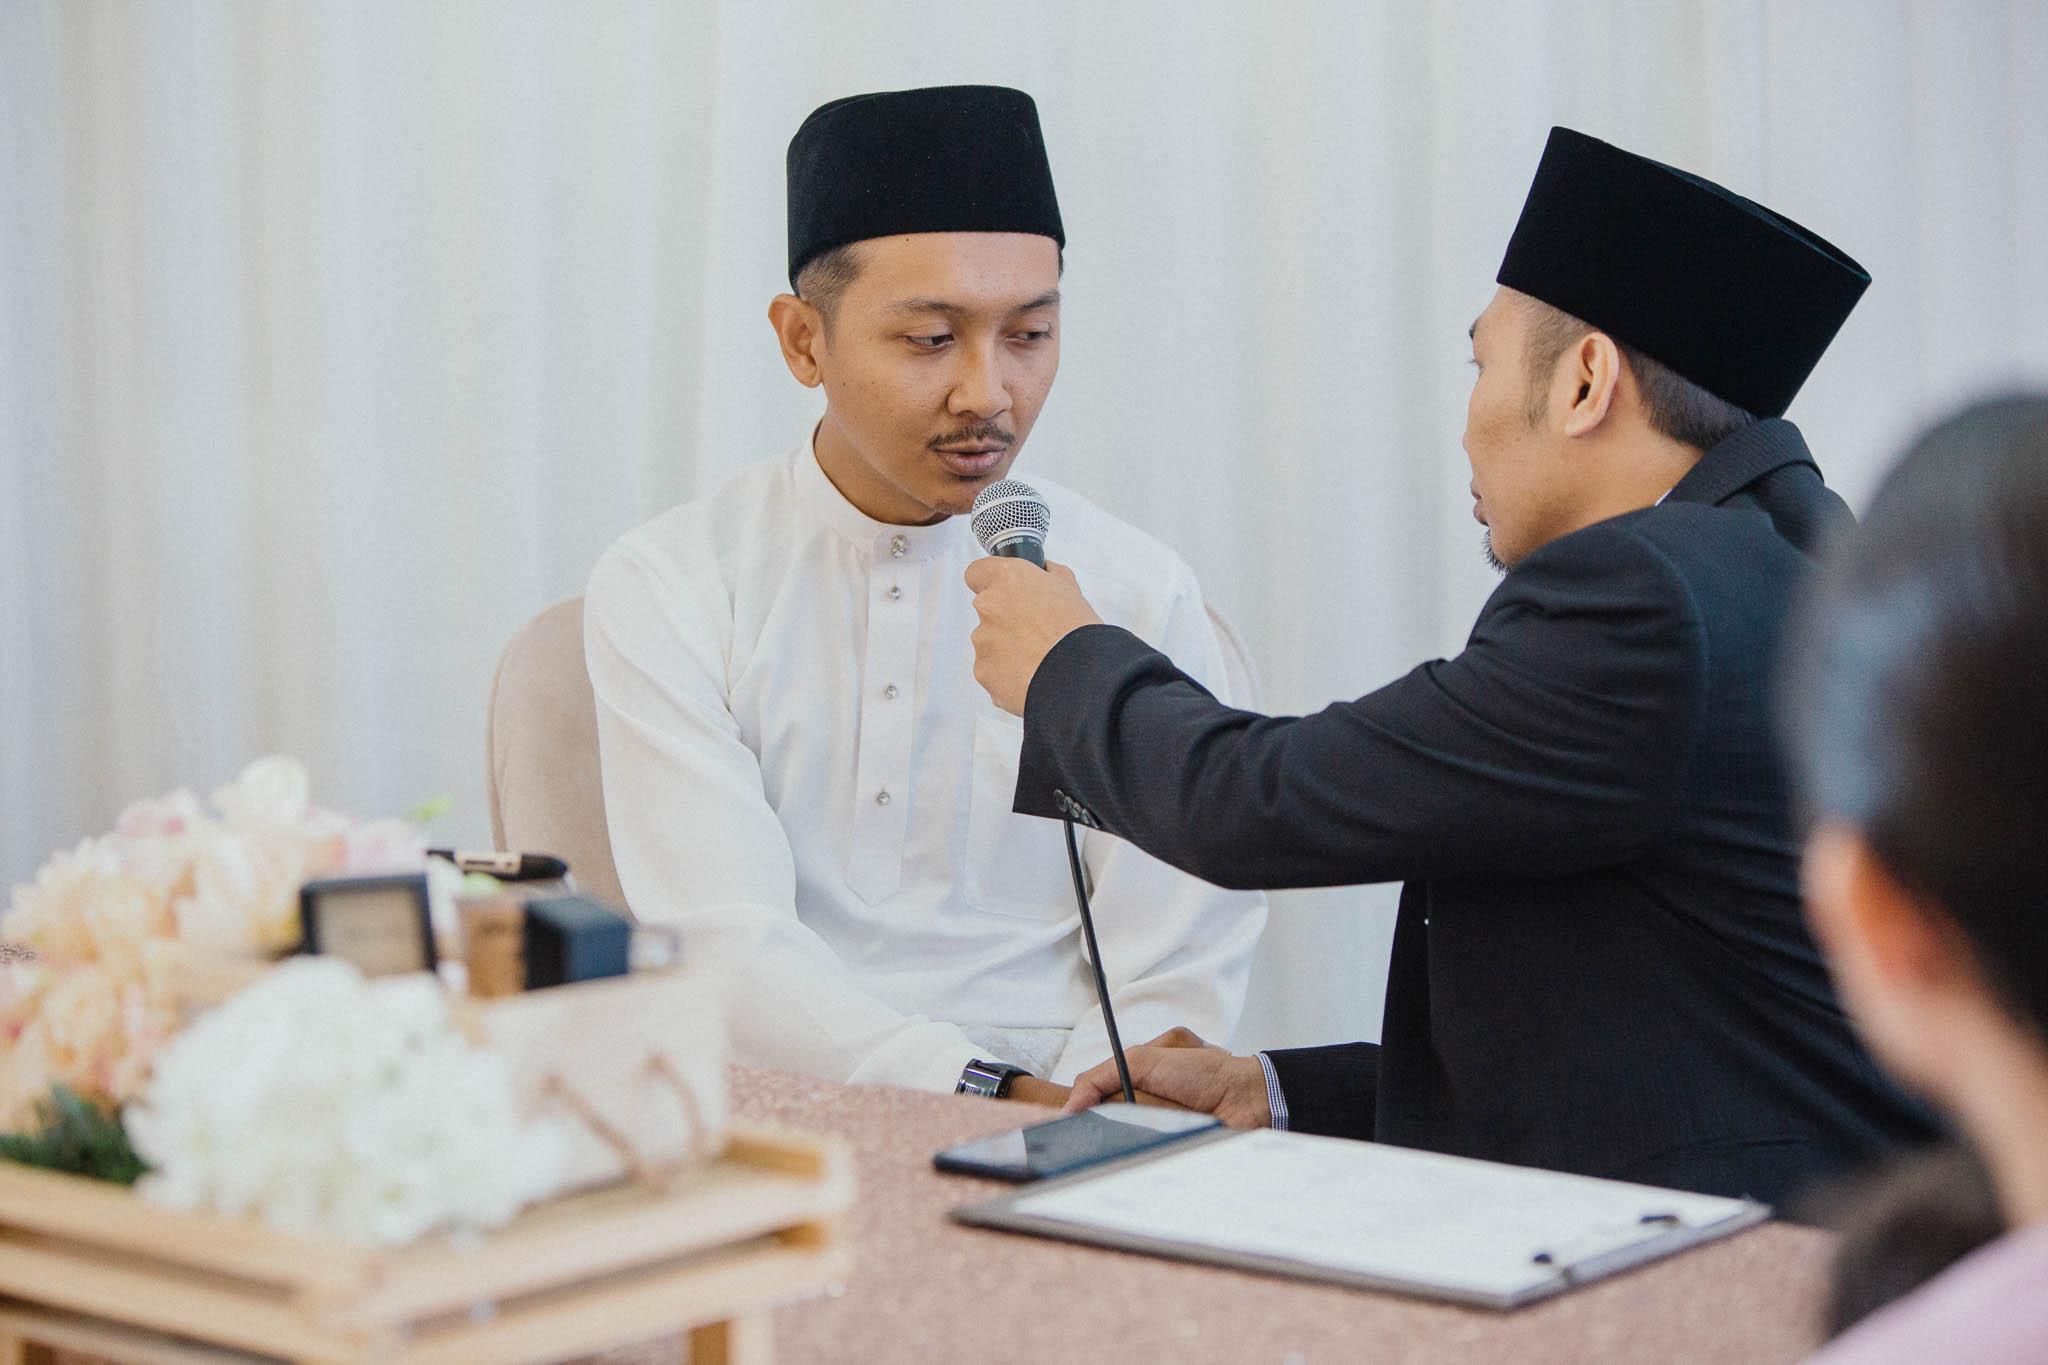 singapore-wedding-photographer-addafiq-nufail-018.jpg